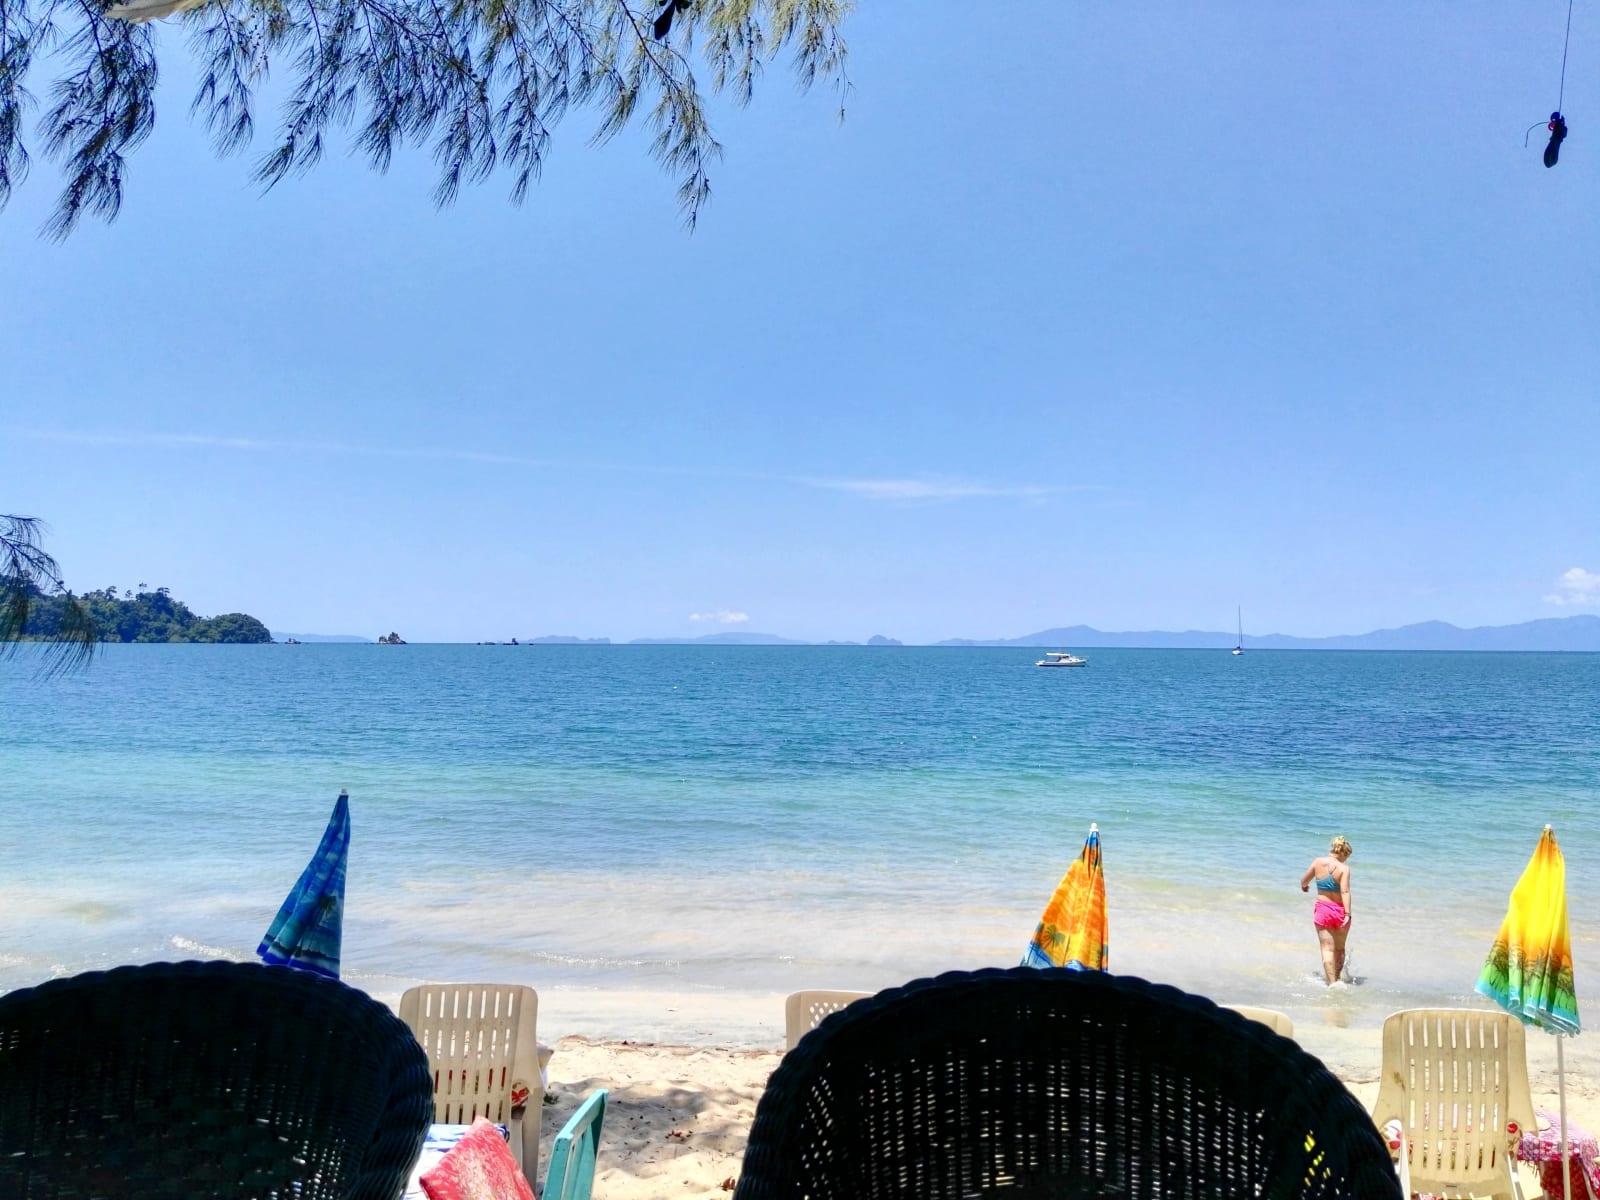 Jižní část Ao Khao Kwai u Heaven Beach resort, Koh Phayam, Thajsko